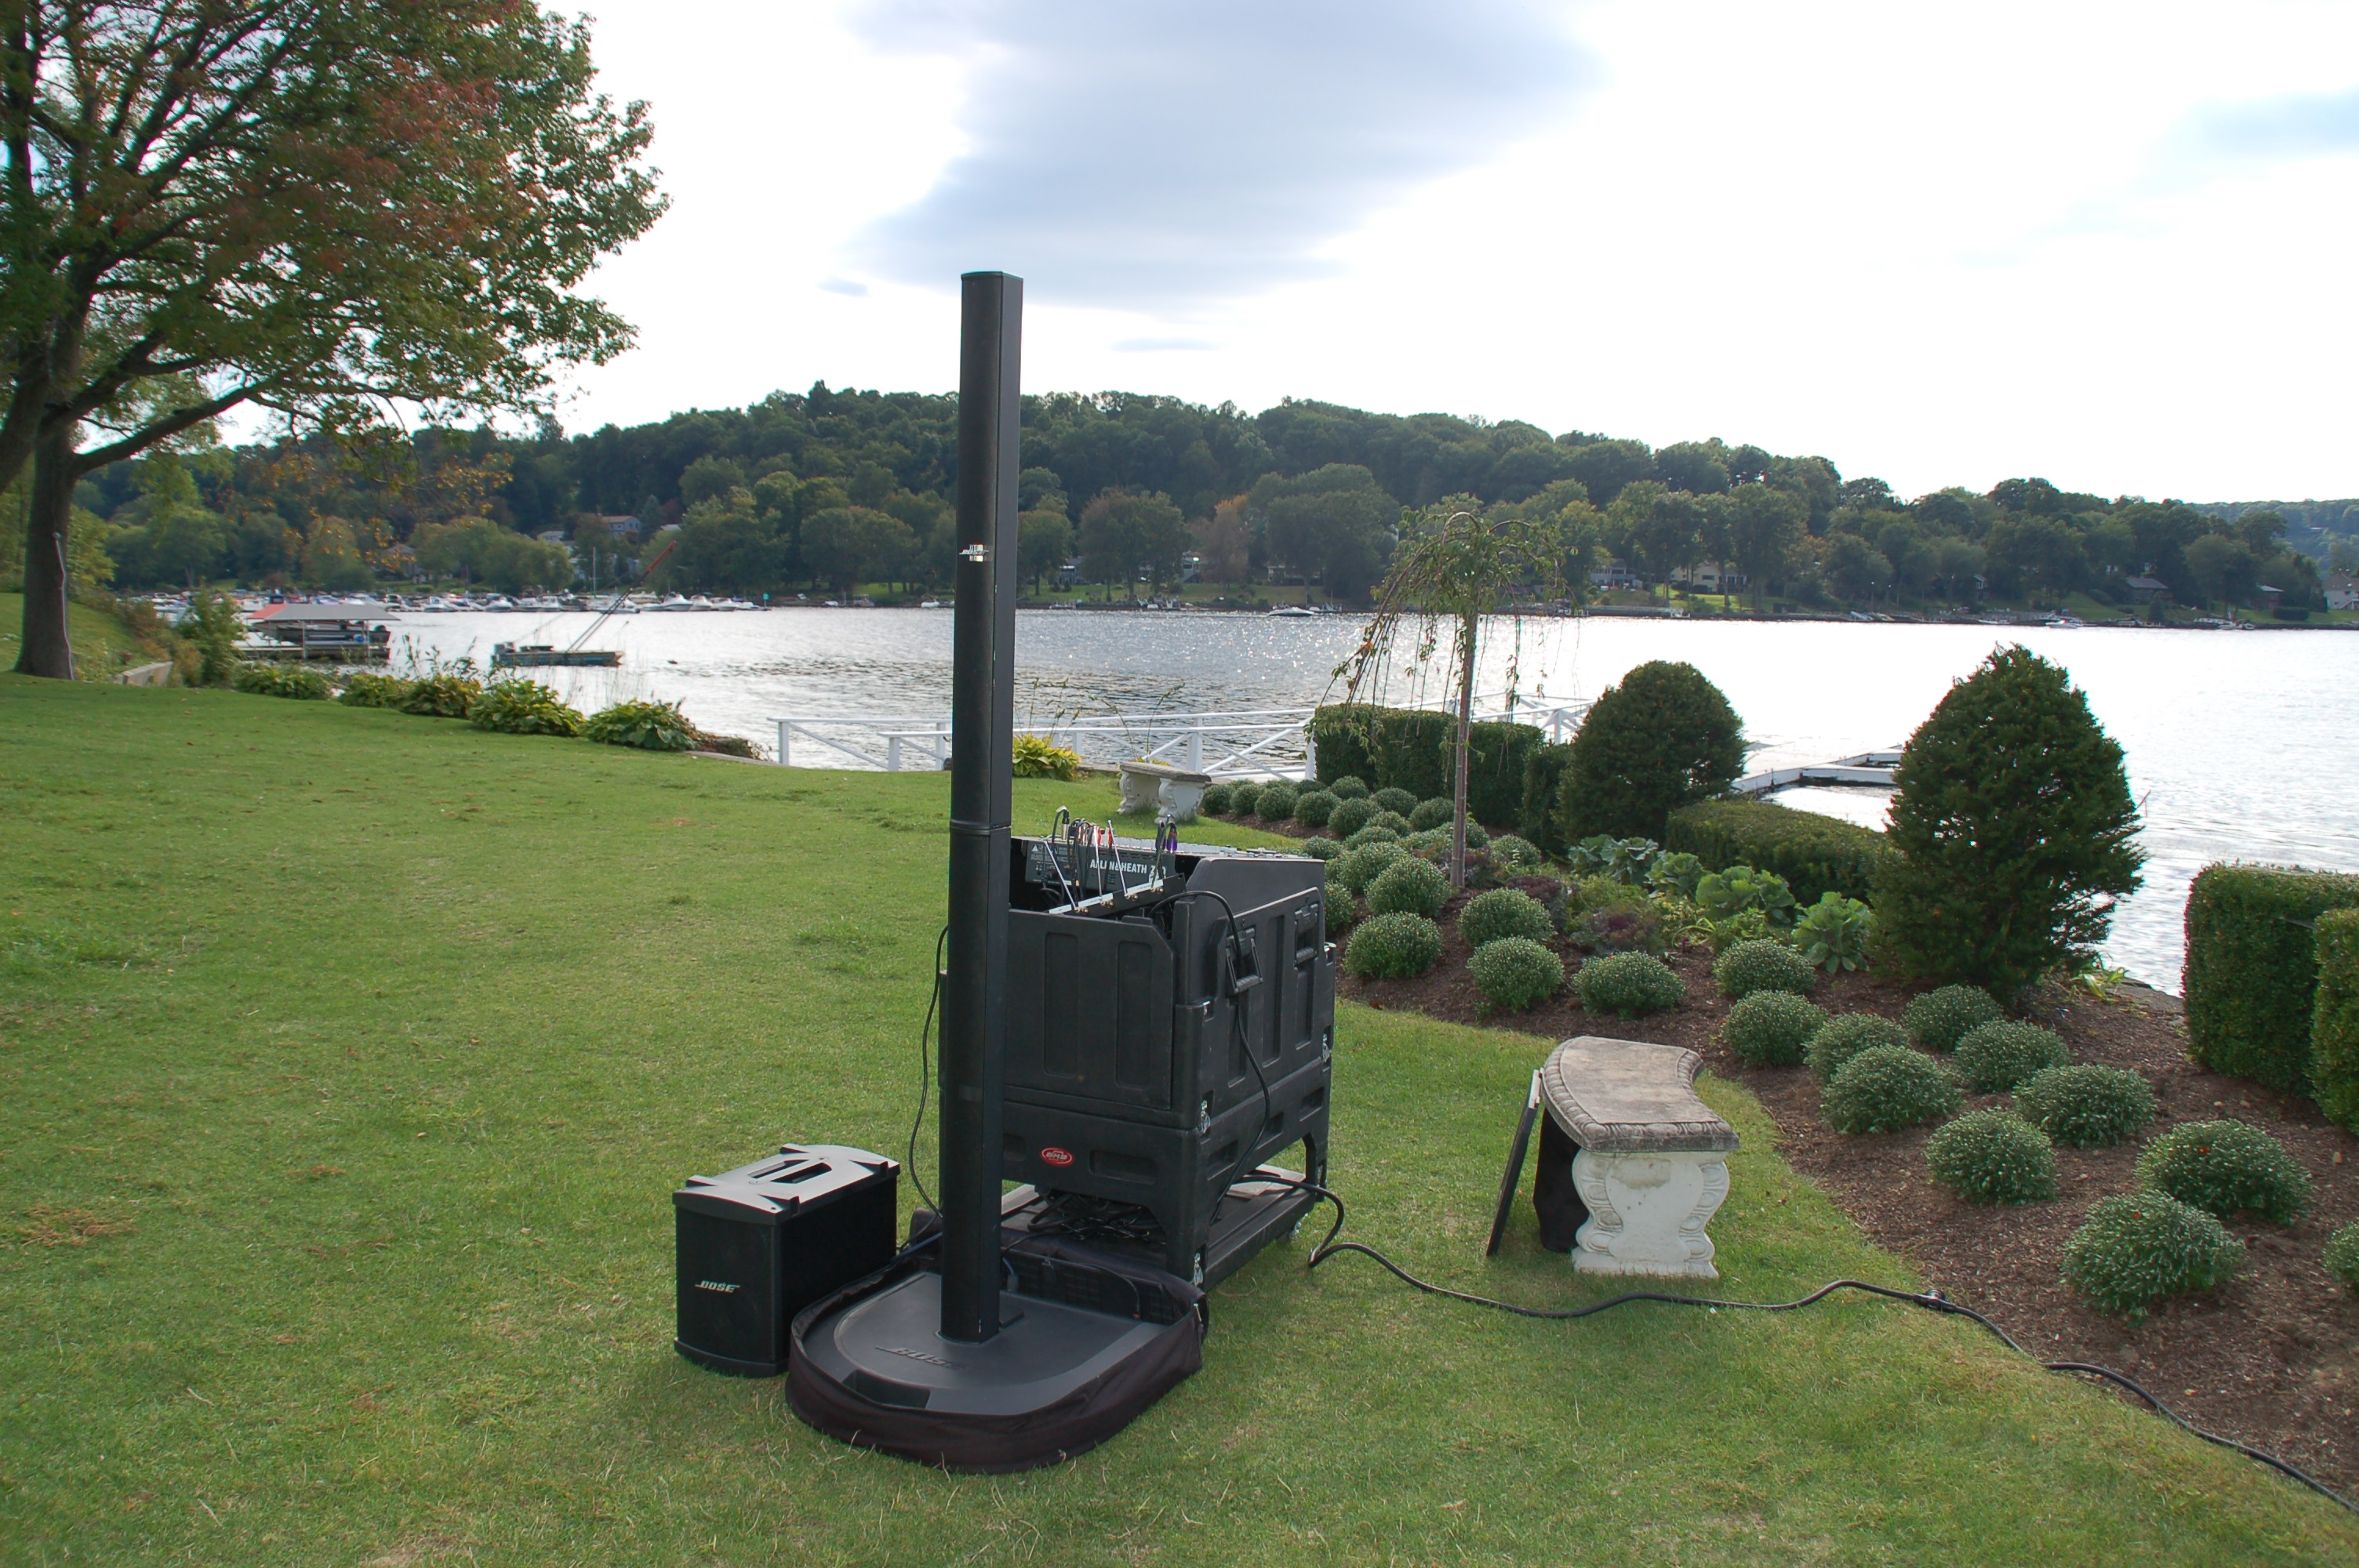 Wireless Speakers Connect Your Wedding Connecticut Wedding Dj